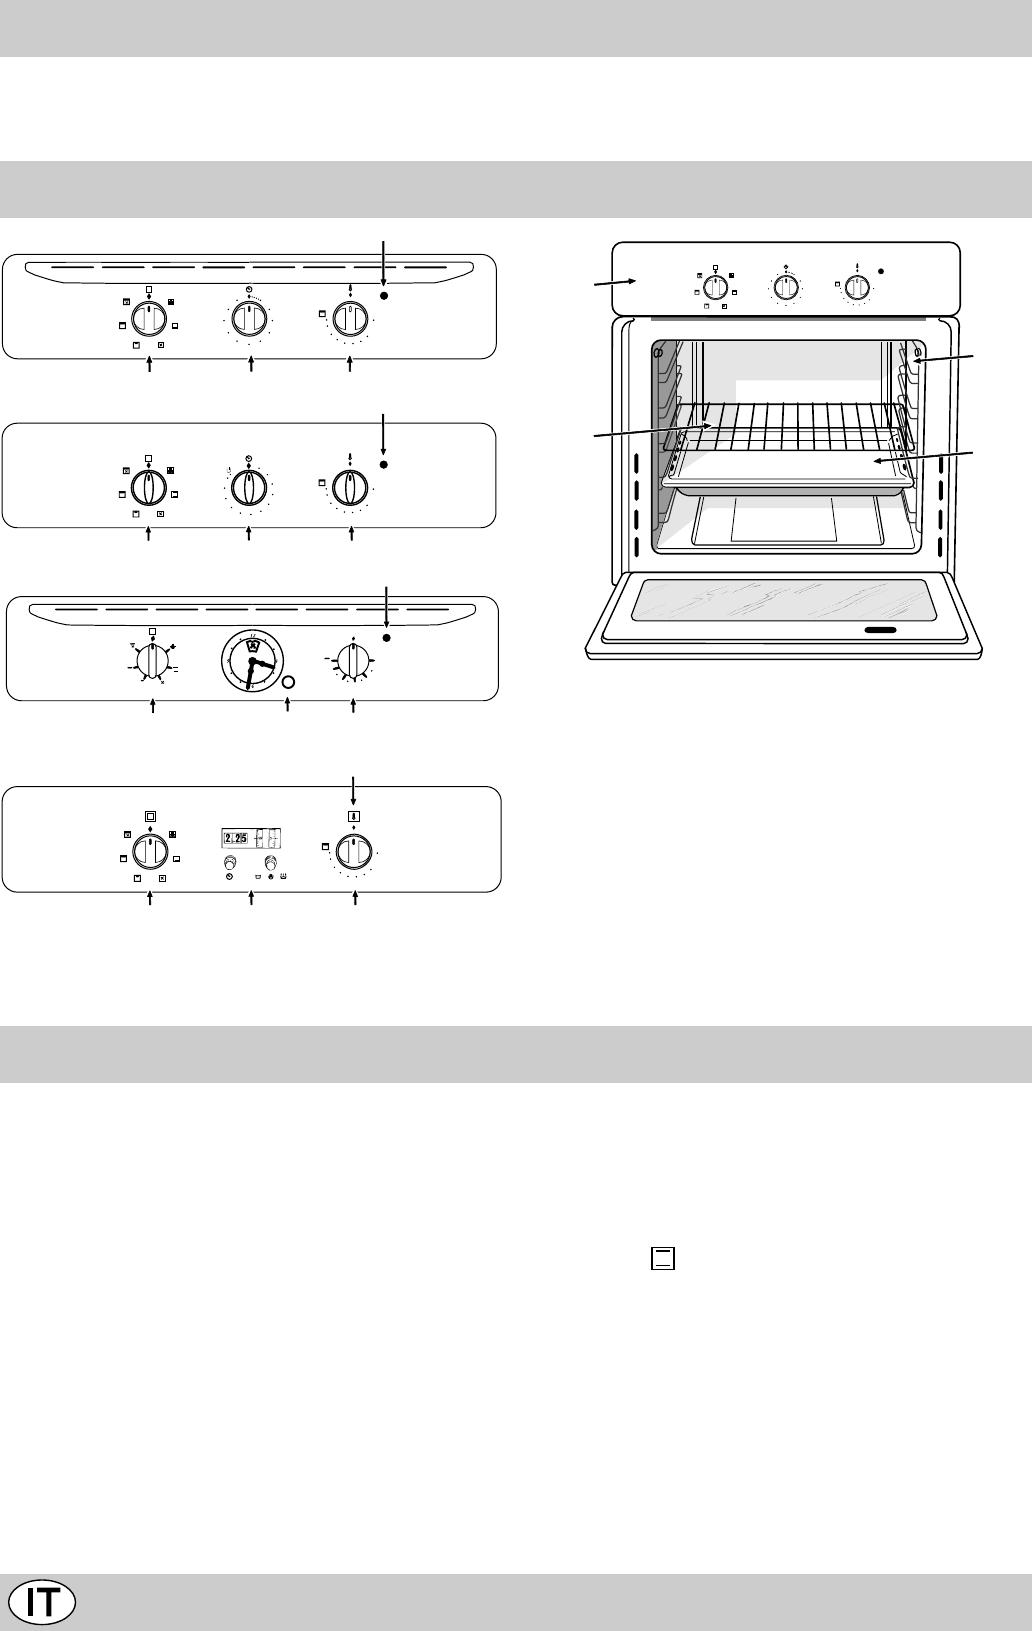 Handleiding Ariston Fd 51 Ice Pagina 1 Van 58 Deutsch